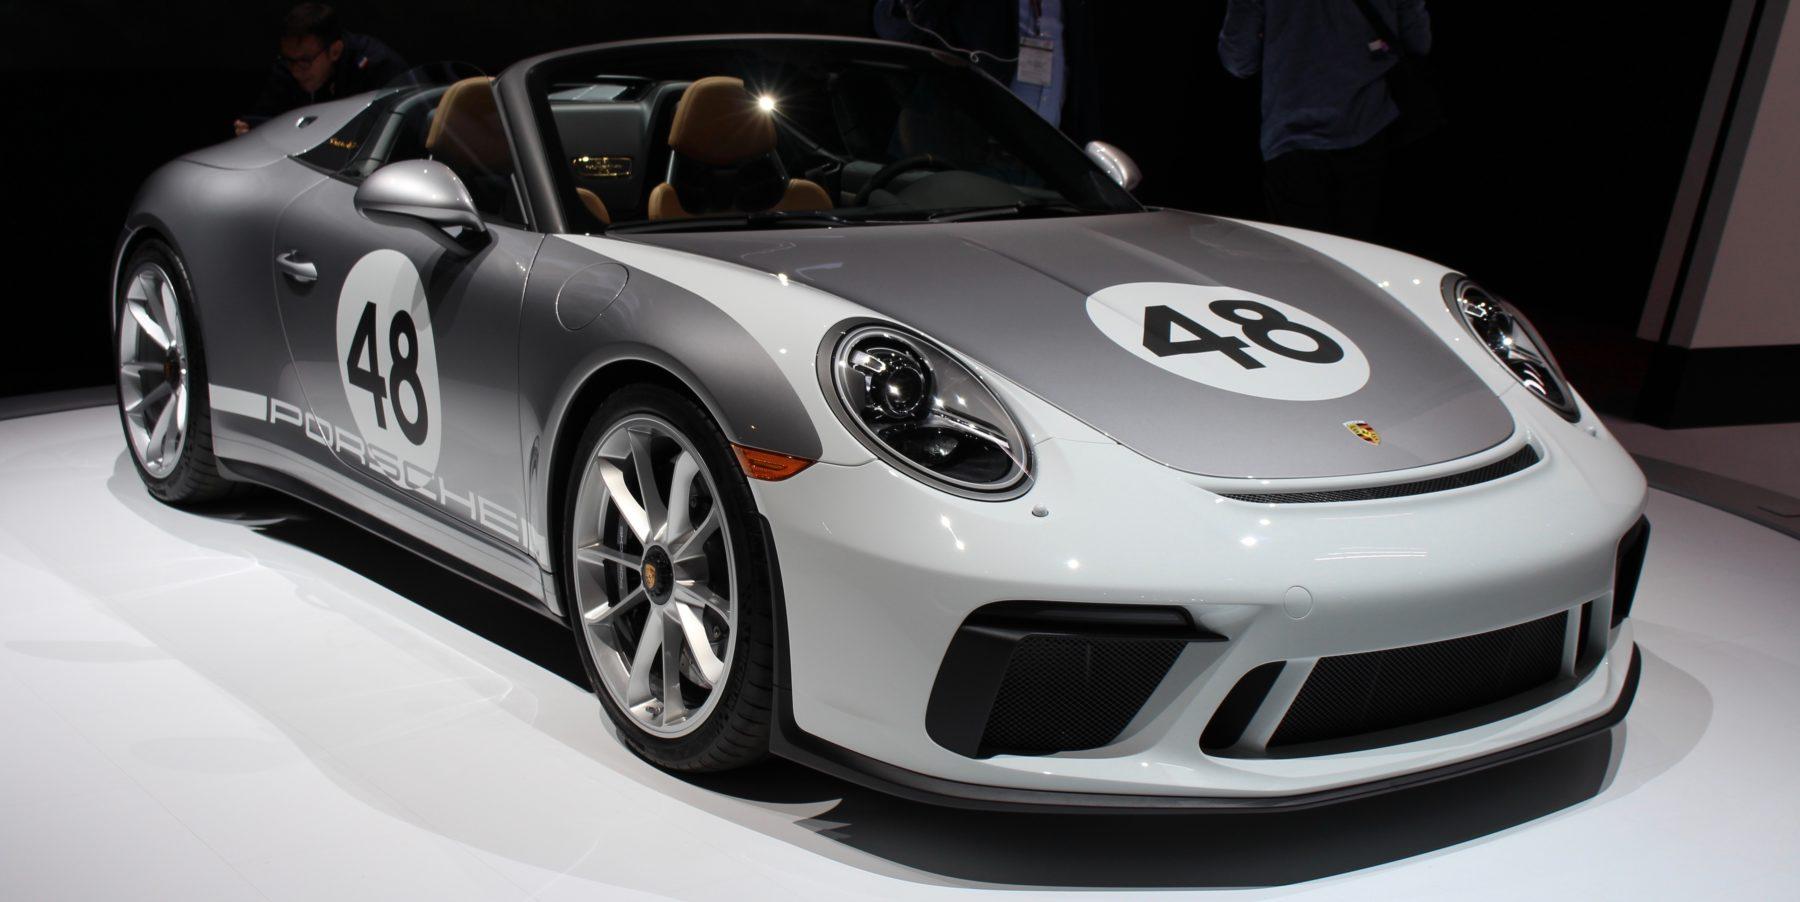 Porsche 911 Speedster Heritage Design Package